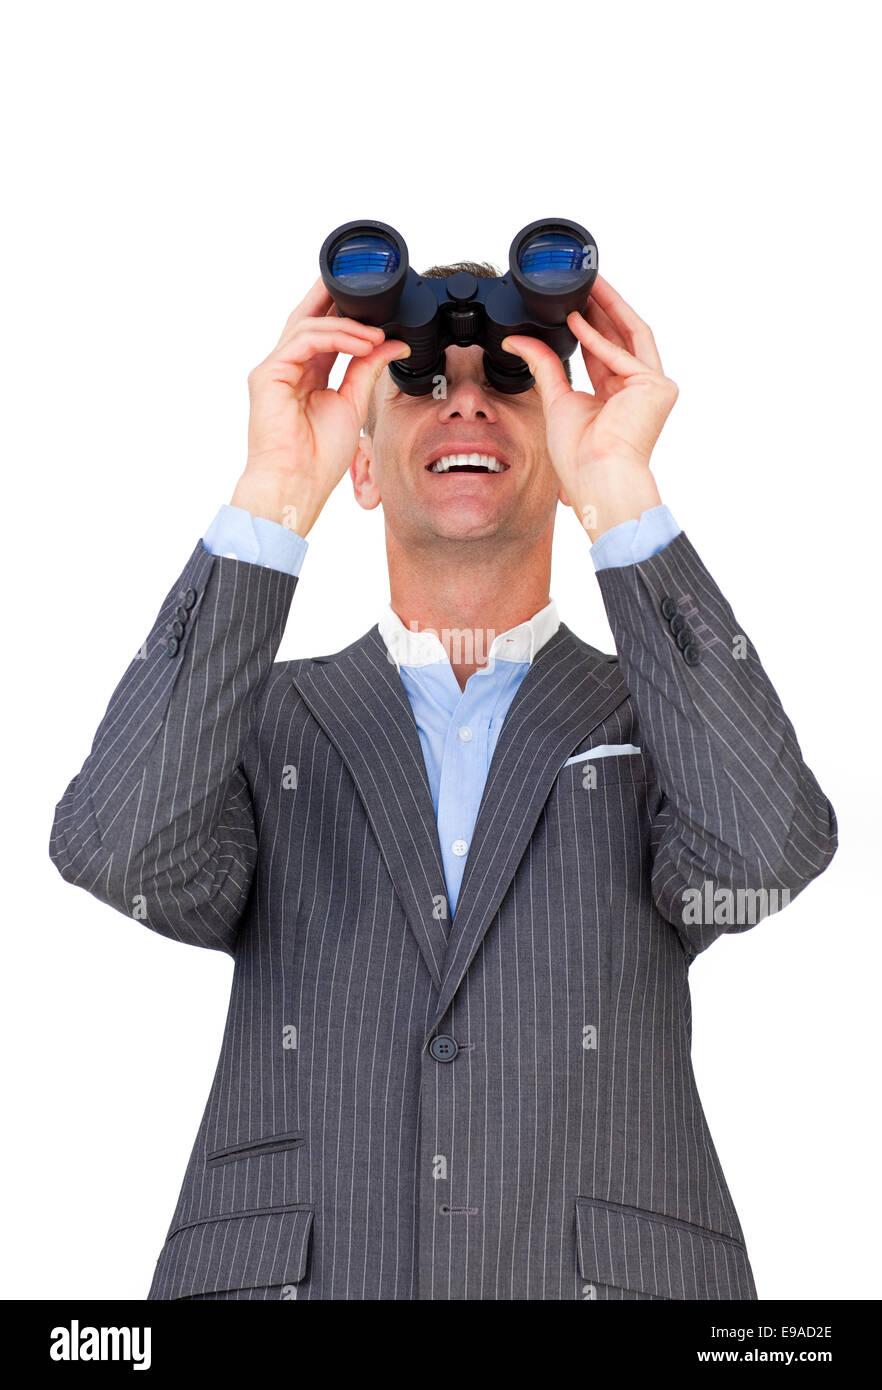 Cheerful businessman predicting future sales - Stock Image